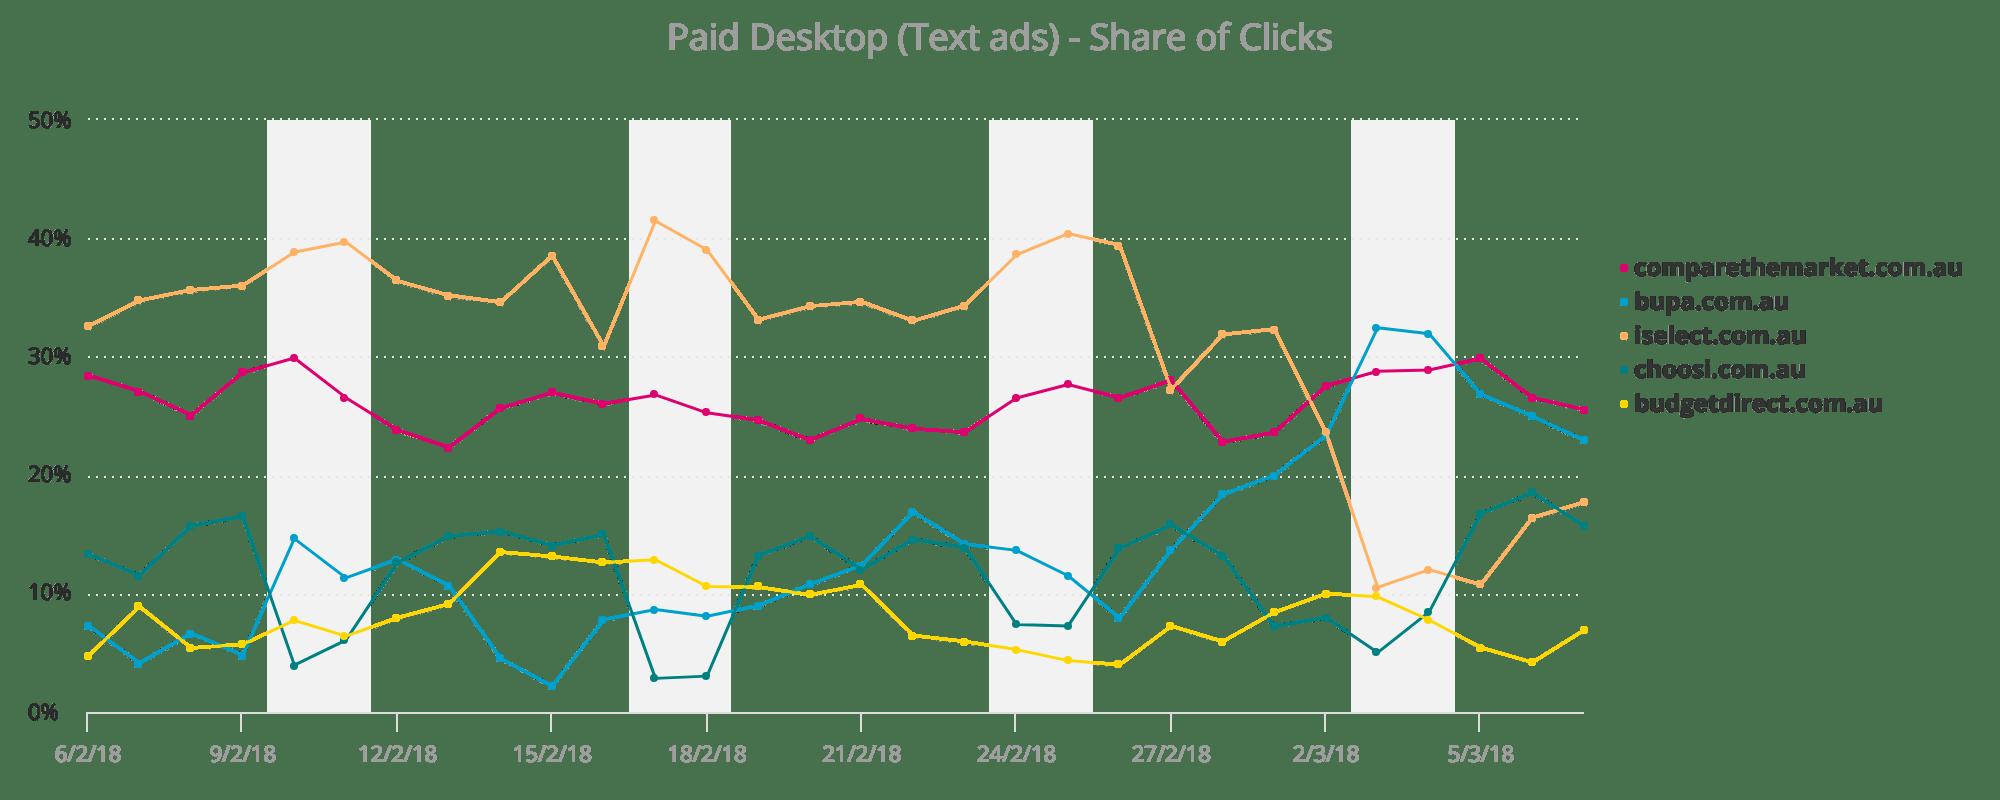 Health Insurance Share of Clicks Desktop